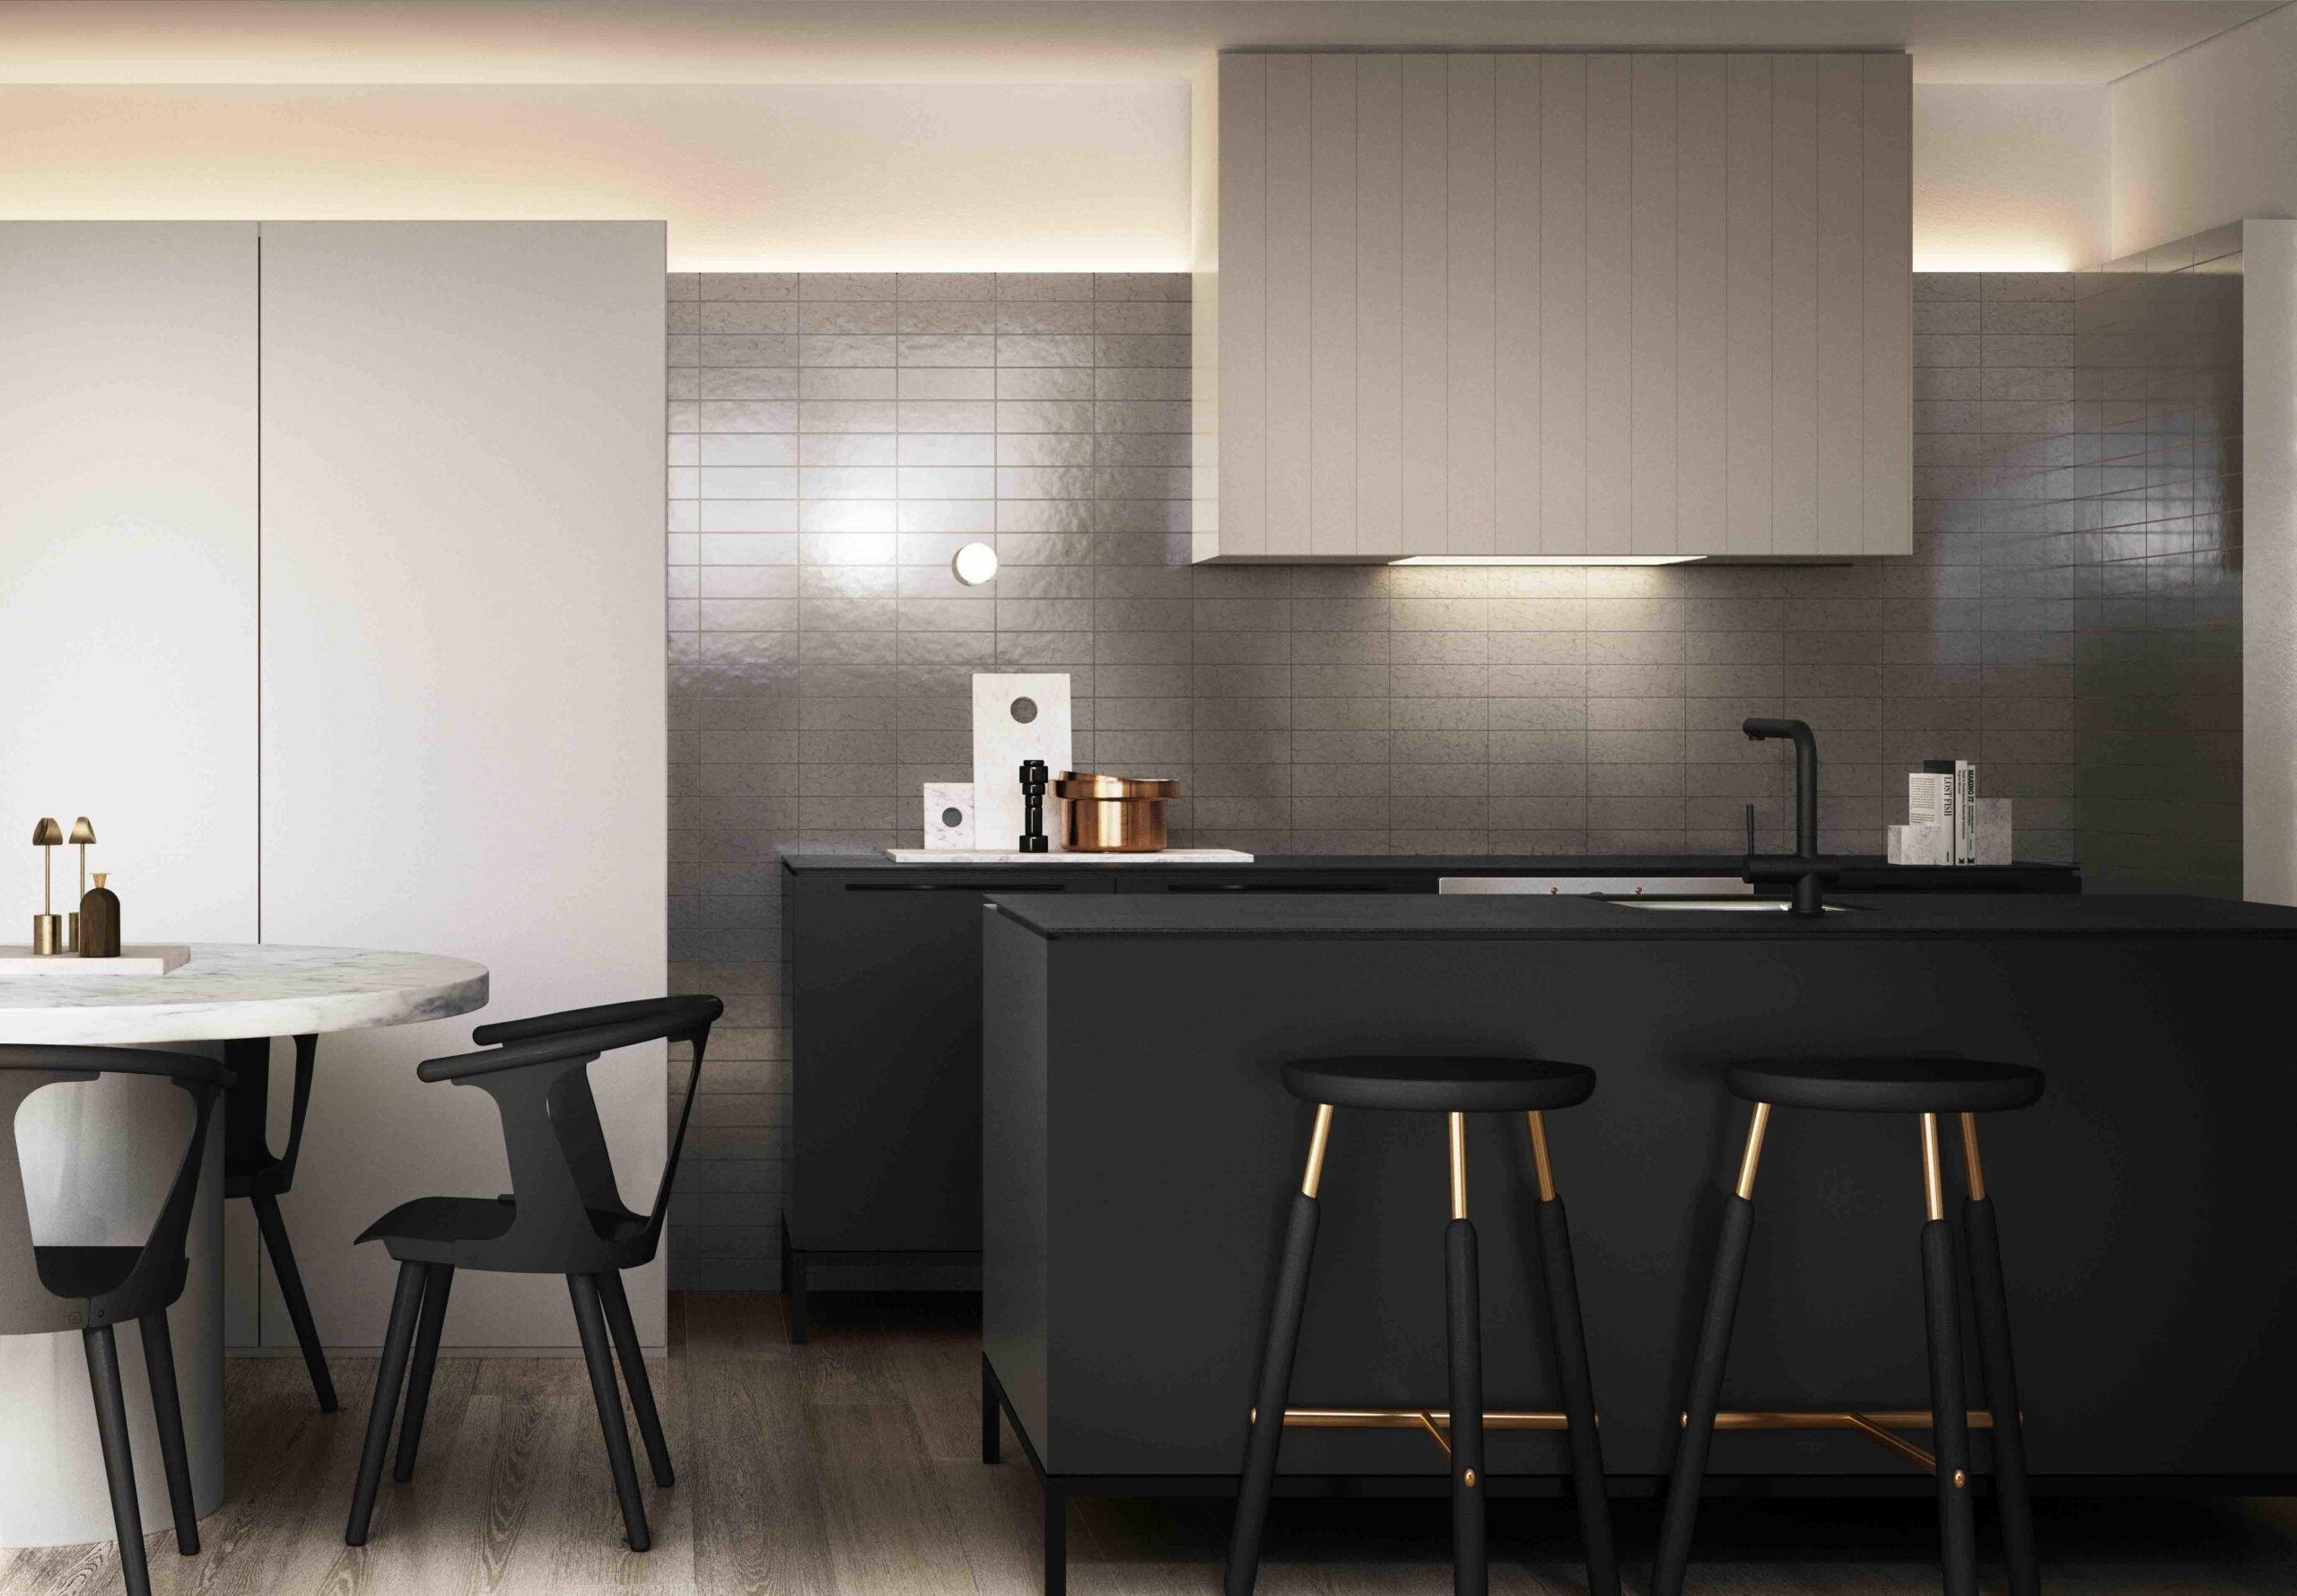 Commercial Kitchens For Sale Brisbane